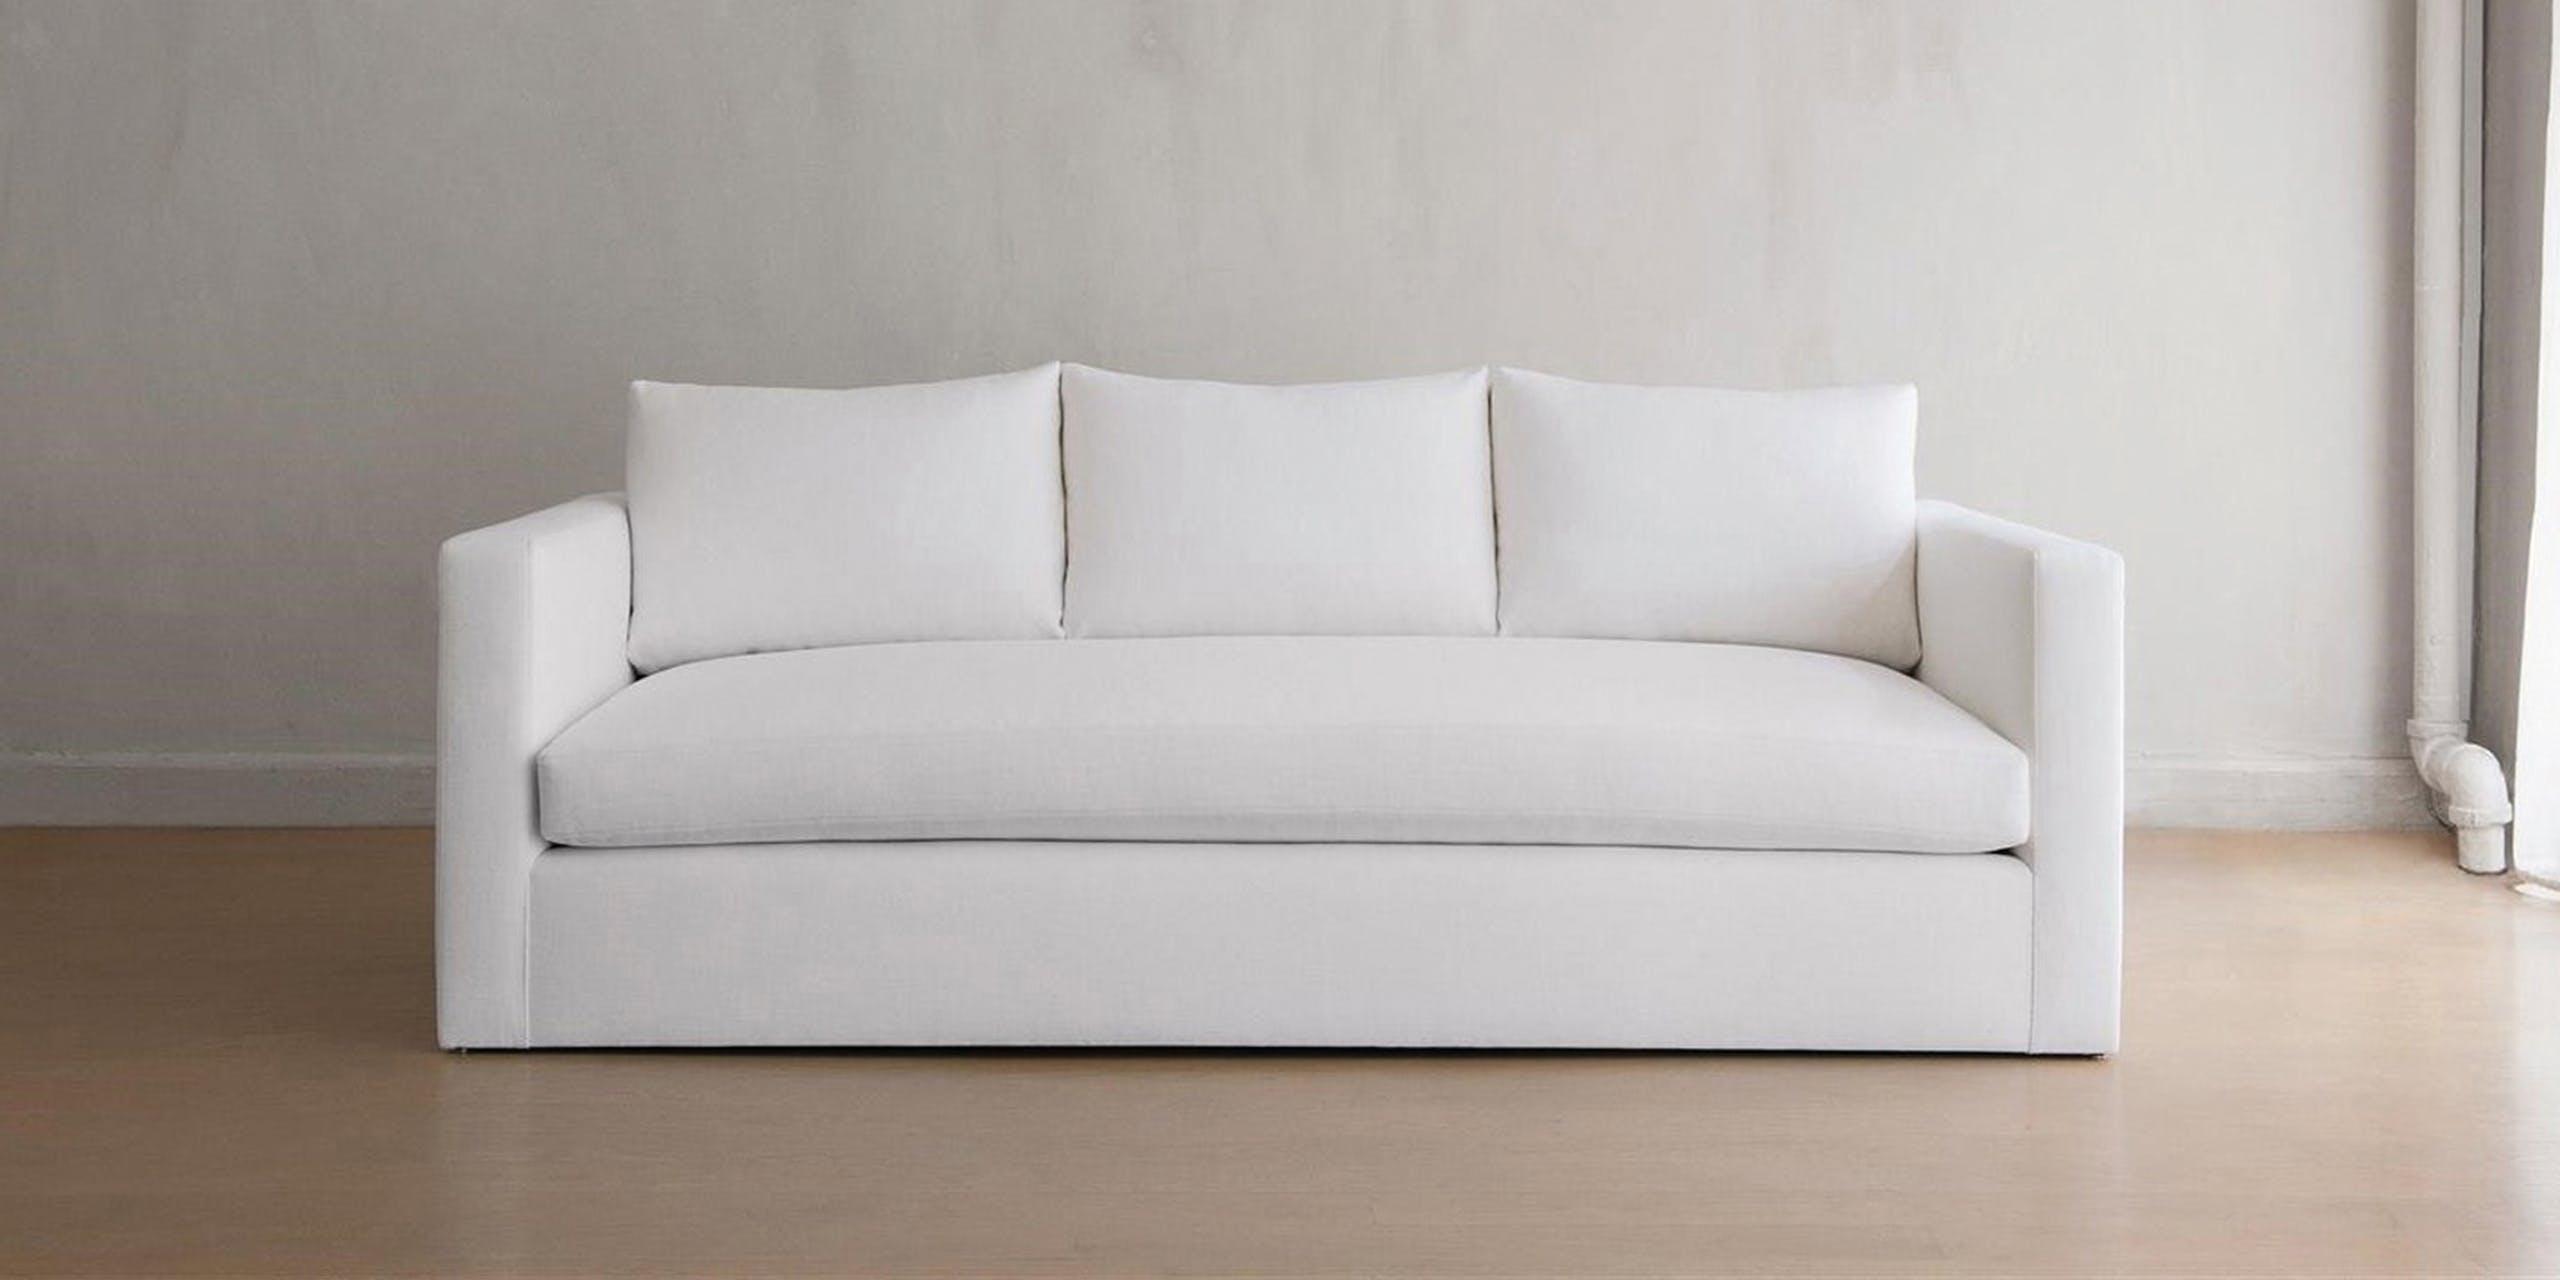 Ludlow sofa main.jpg?ixlib=rails 2.1